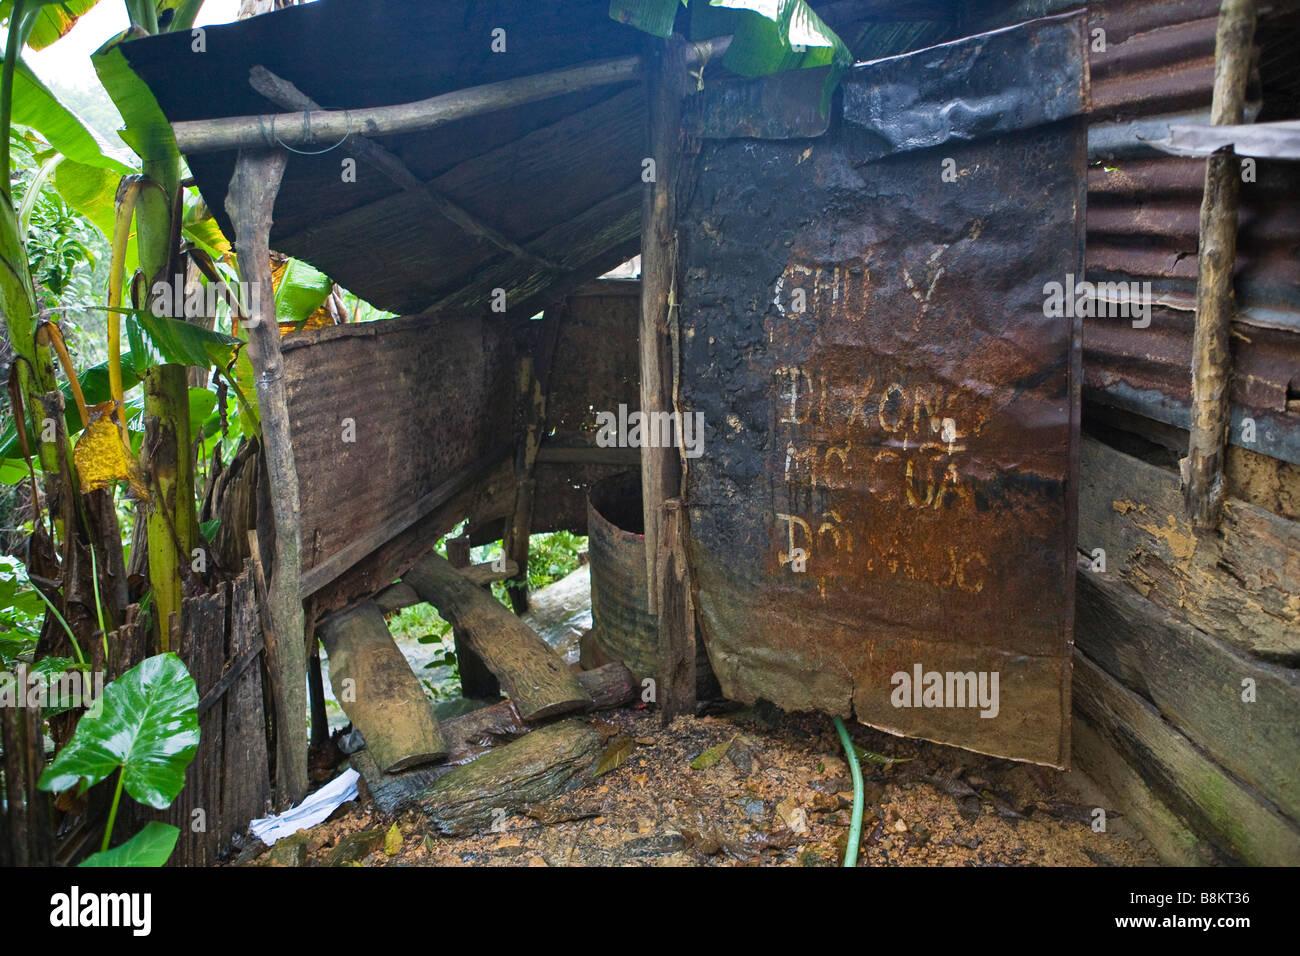 village toilet in vietnam - Stock Image